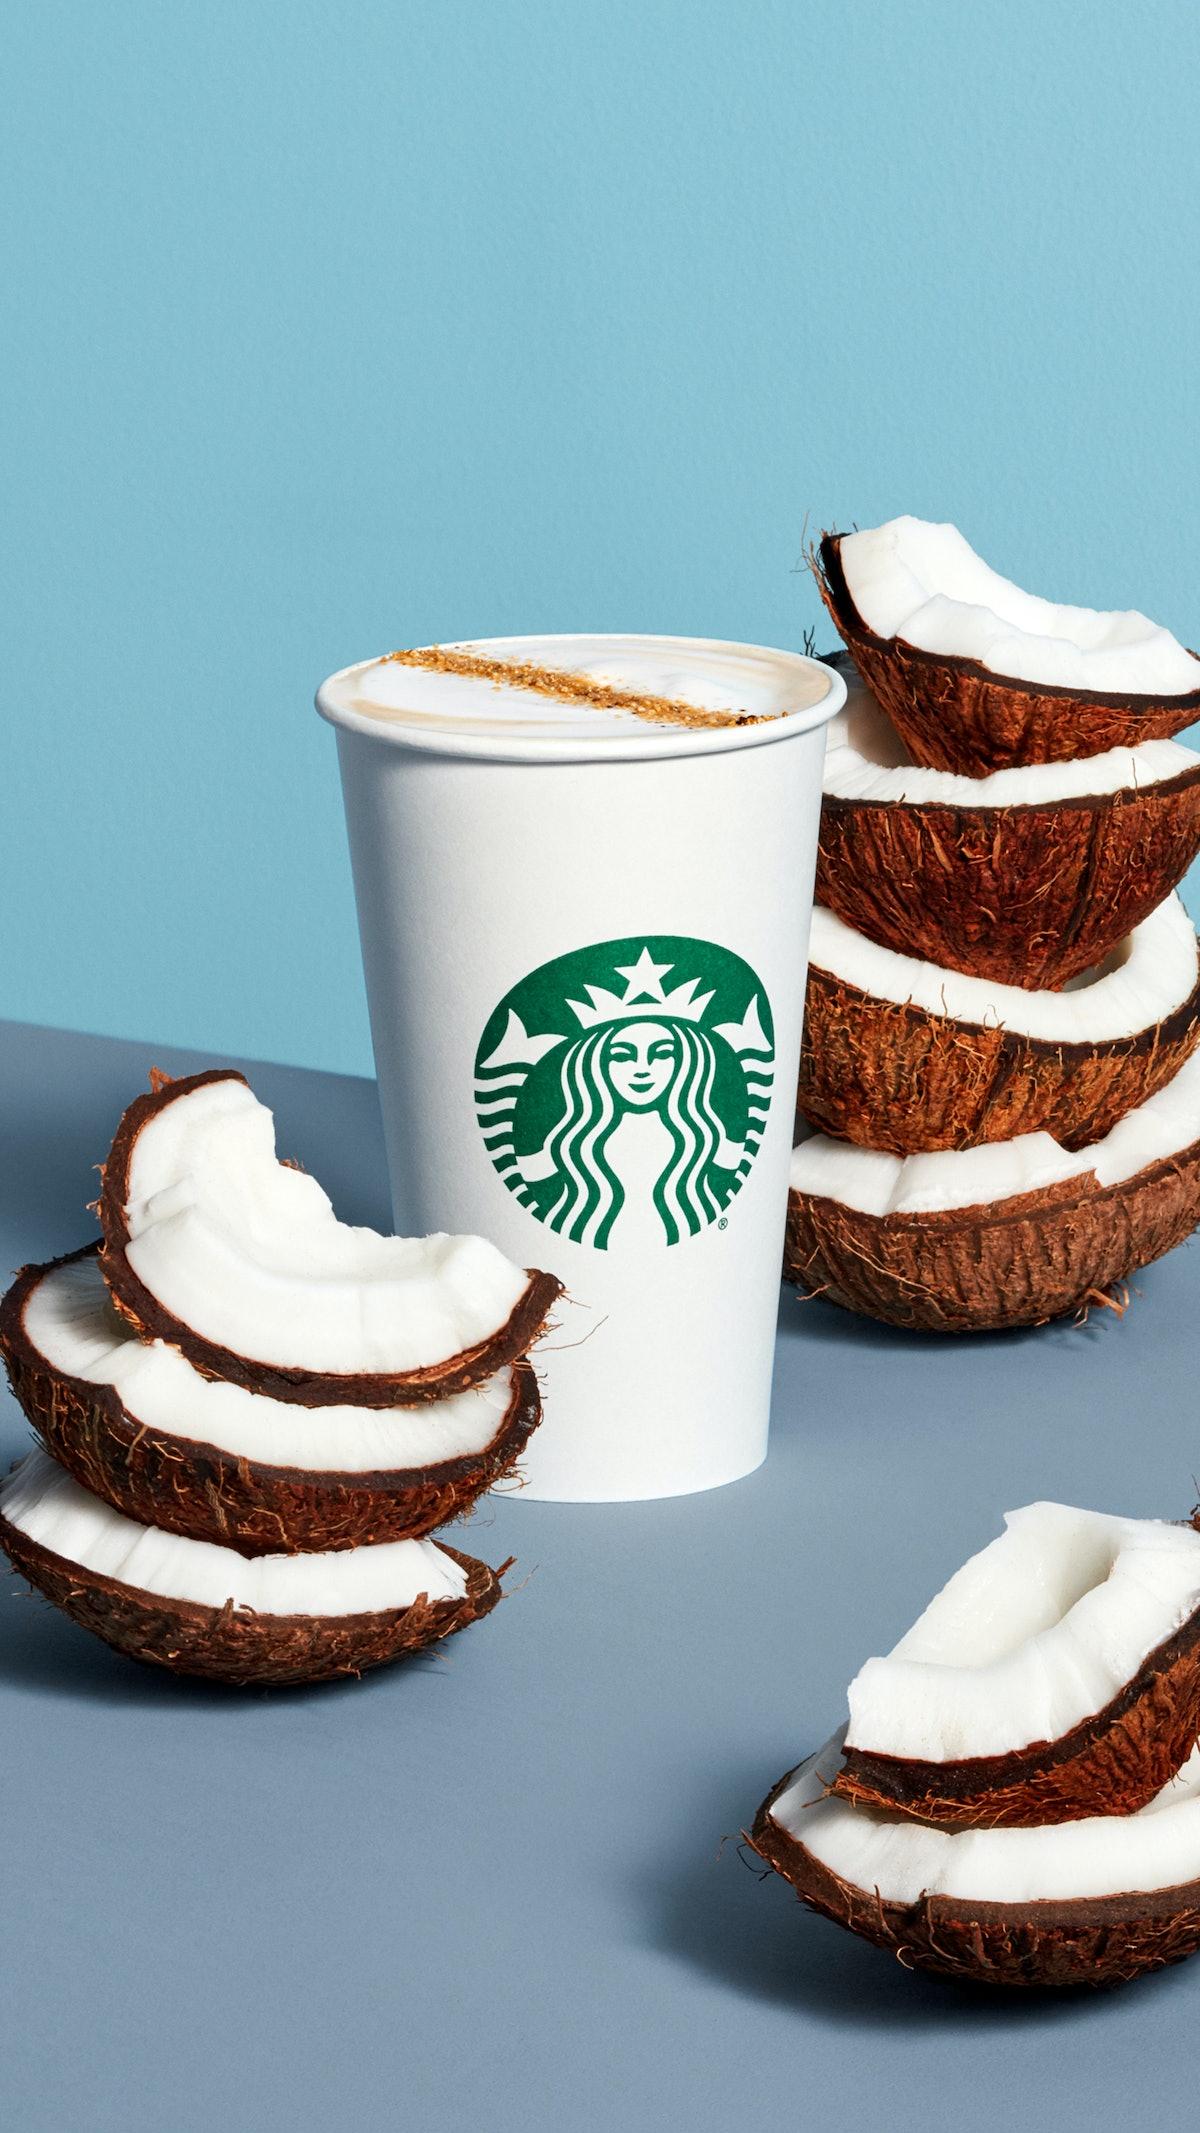 Starbucks' Coconutmilk Latte Is A Tasty New Sip.